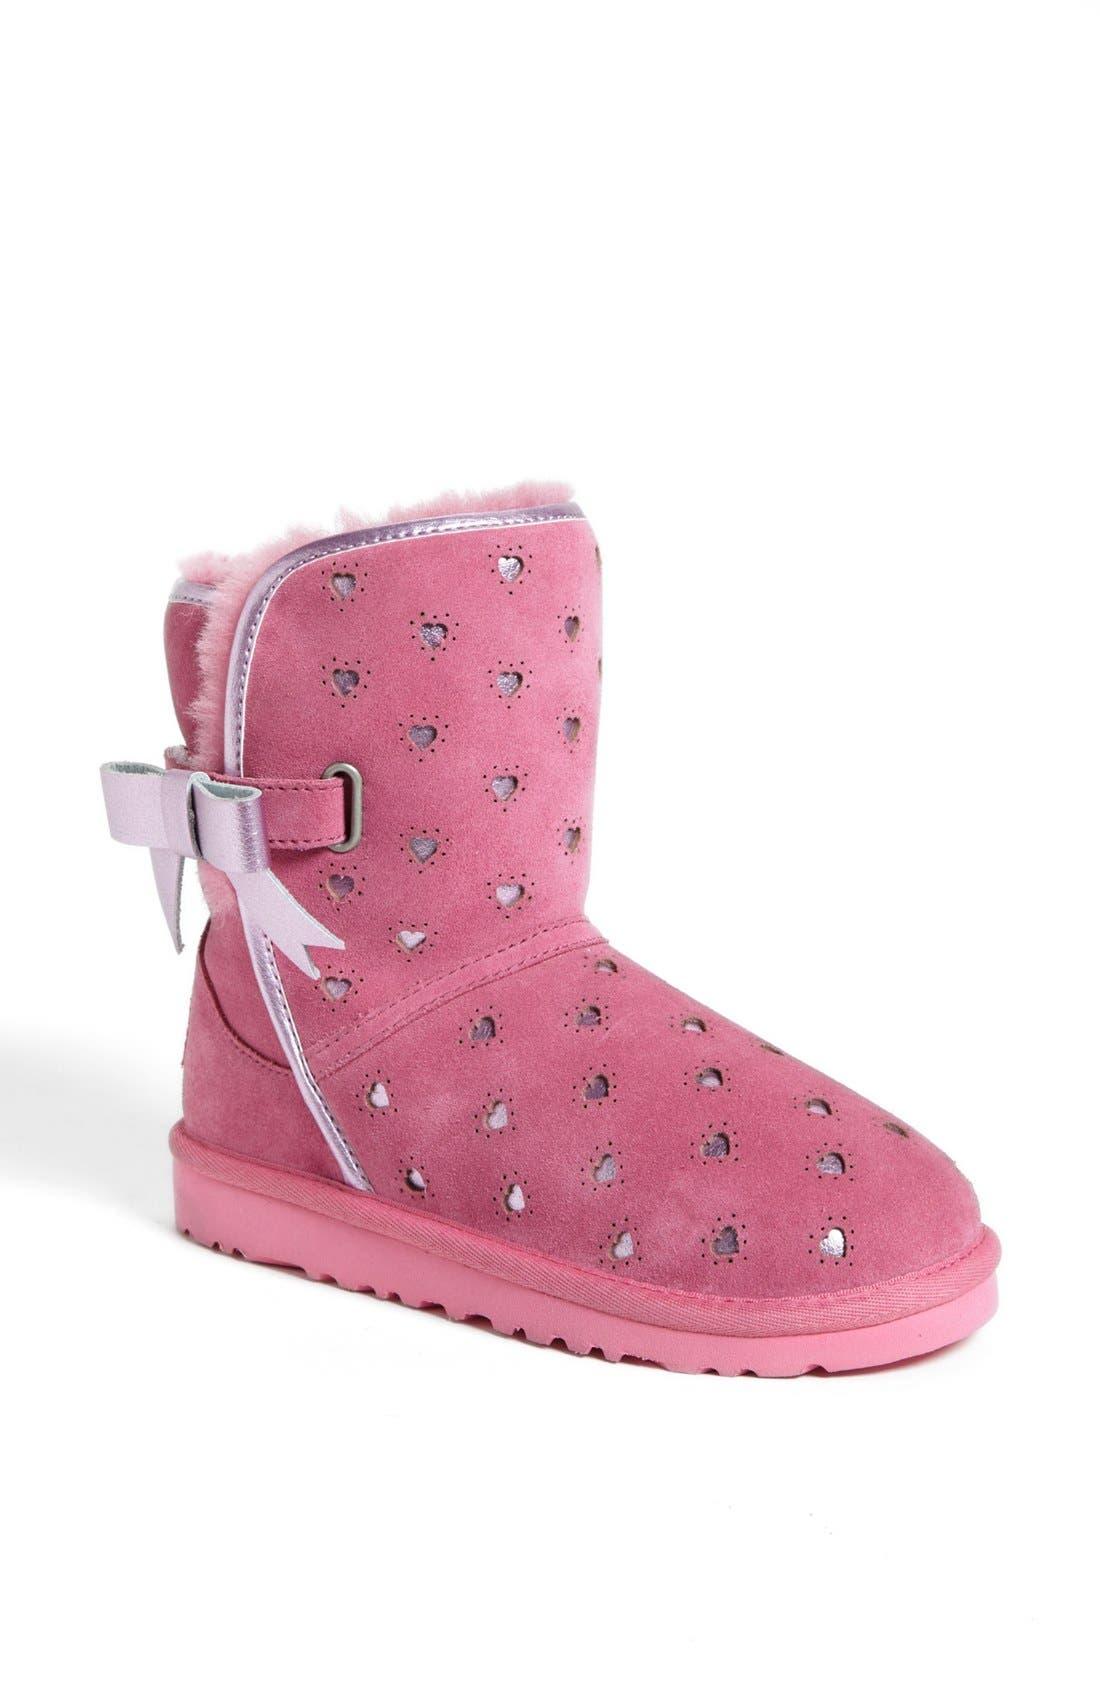 Alternate Image 1 Selected - UGG® Australia 'Joleigh Glitter' Boot (Toddler, Little Kid & Big Kid) (Nordstrom Exclusive)